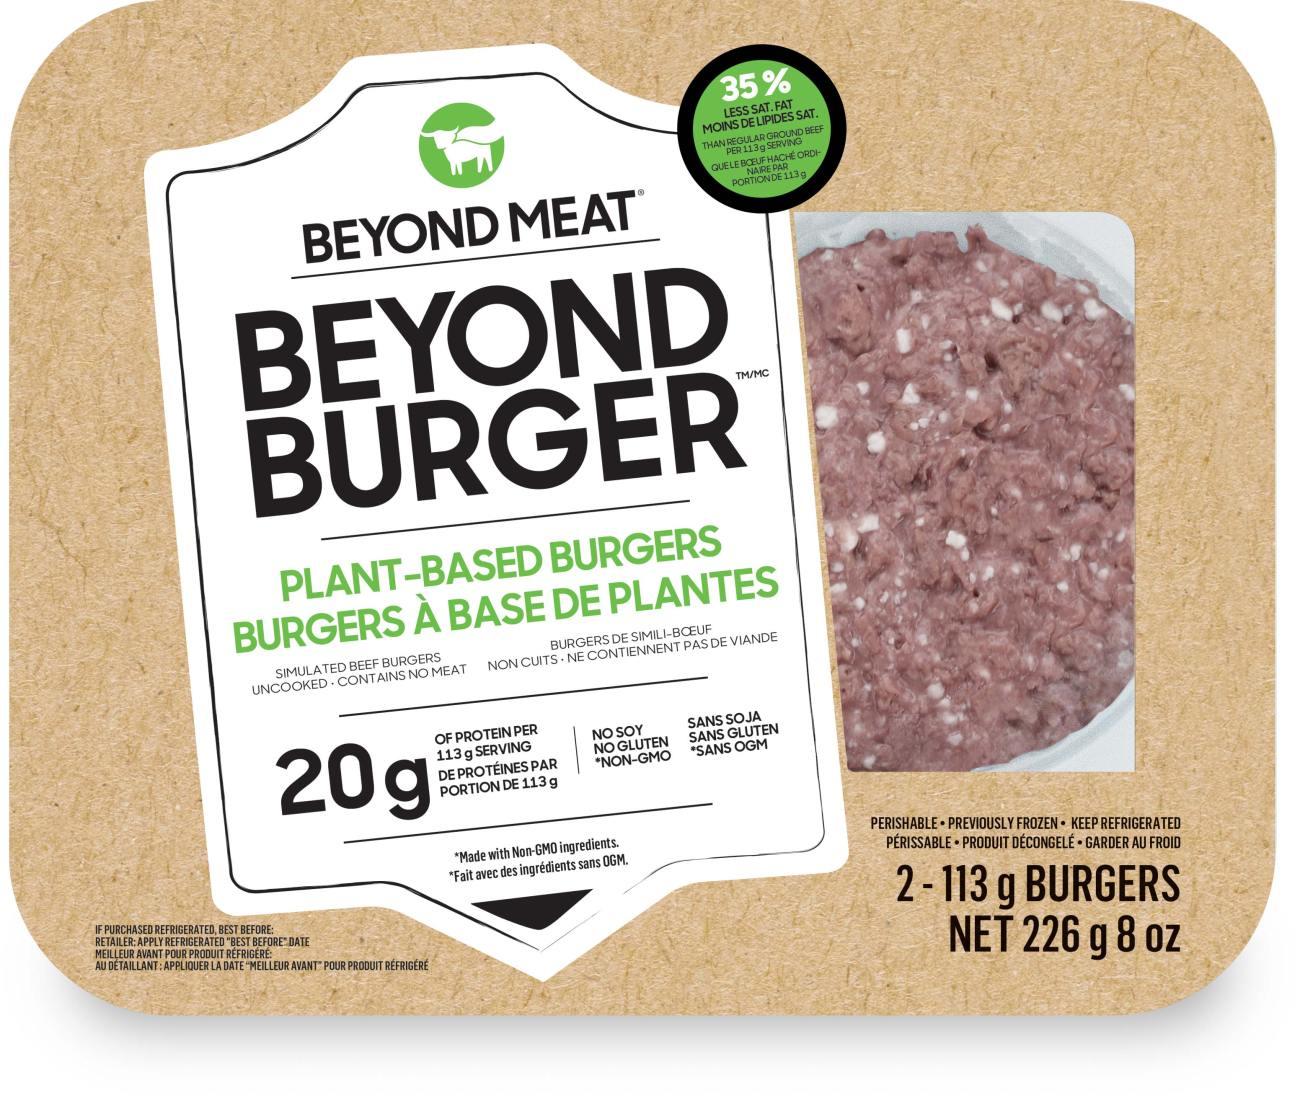 Emballage de Beyond burger